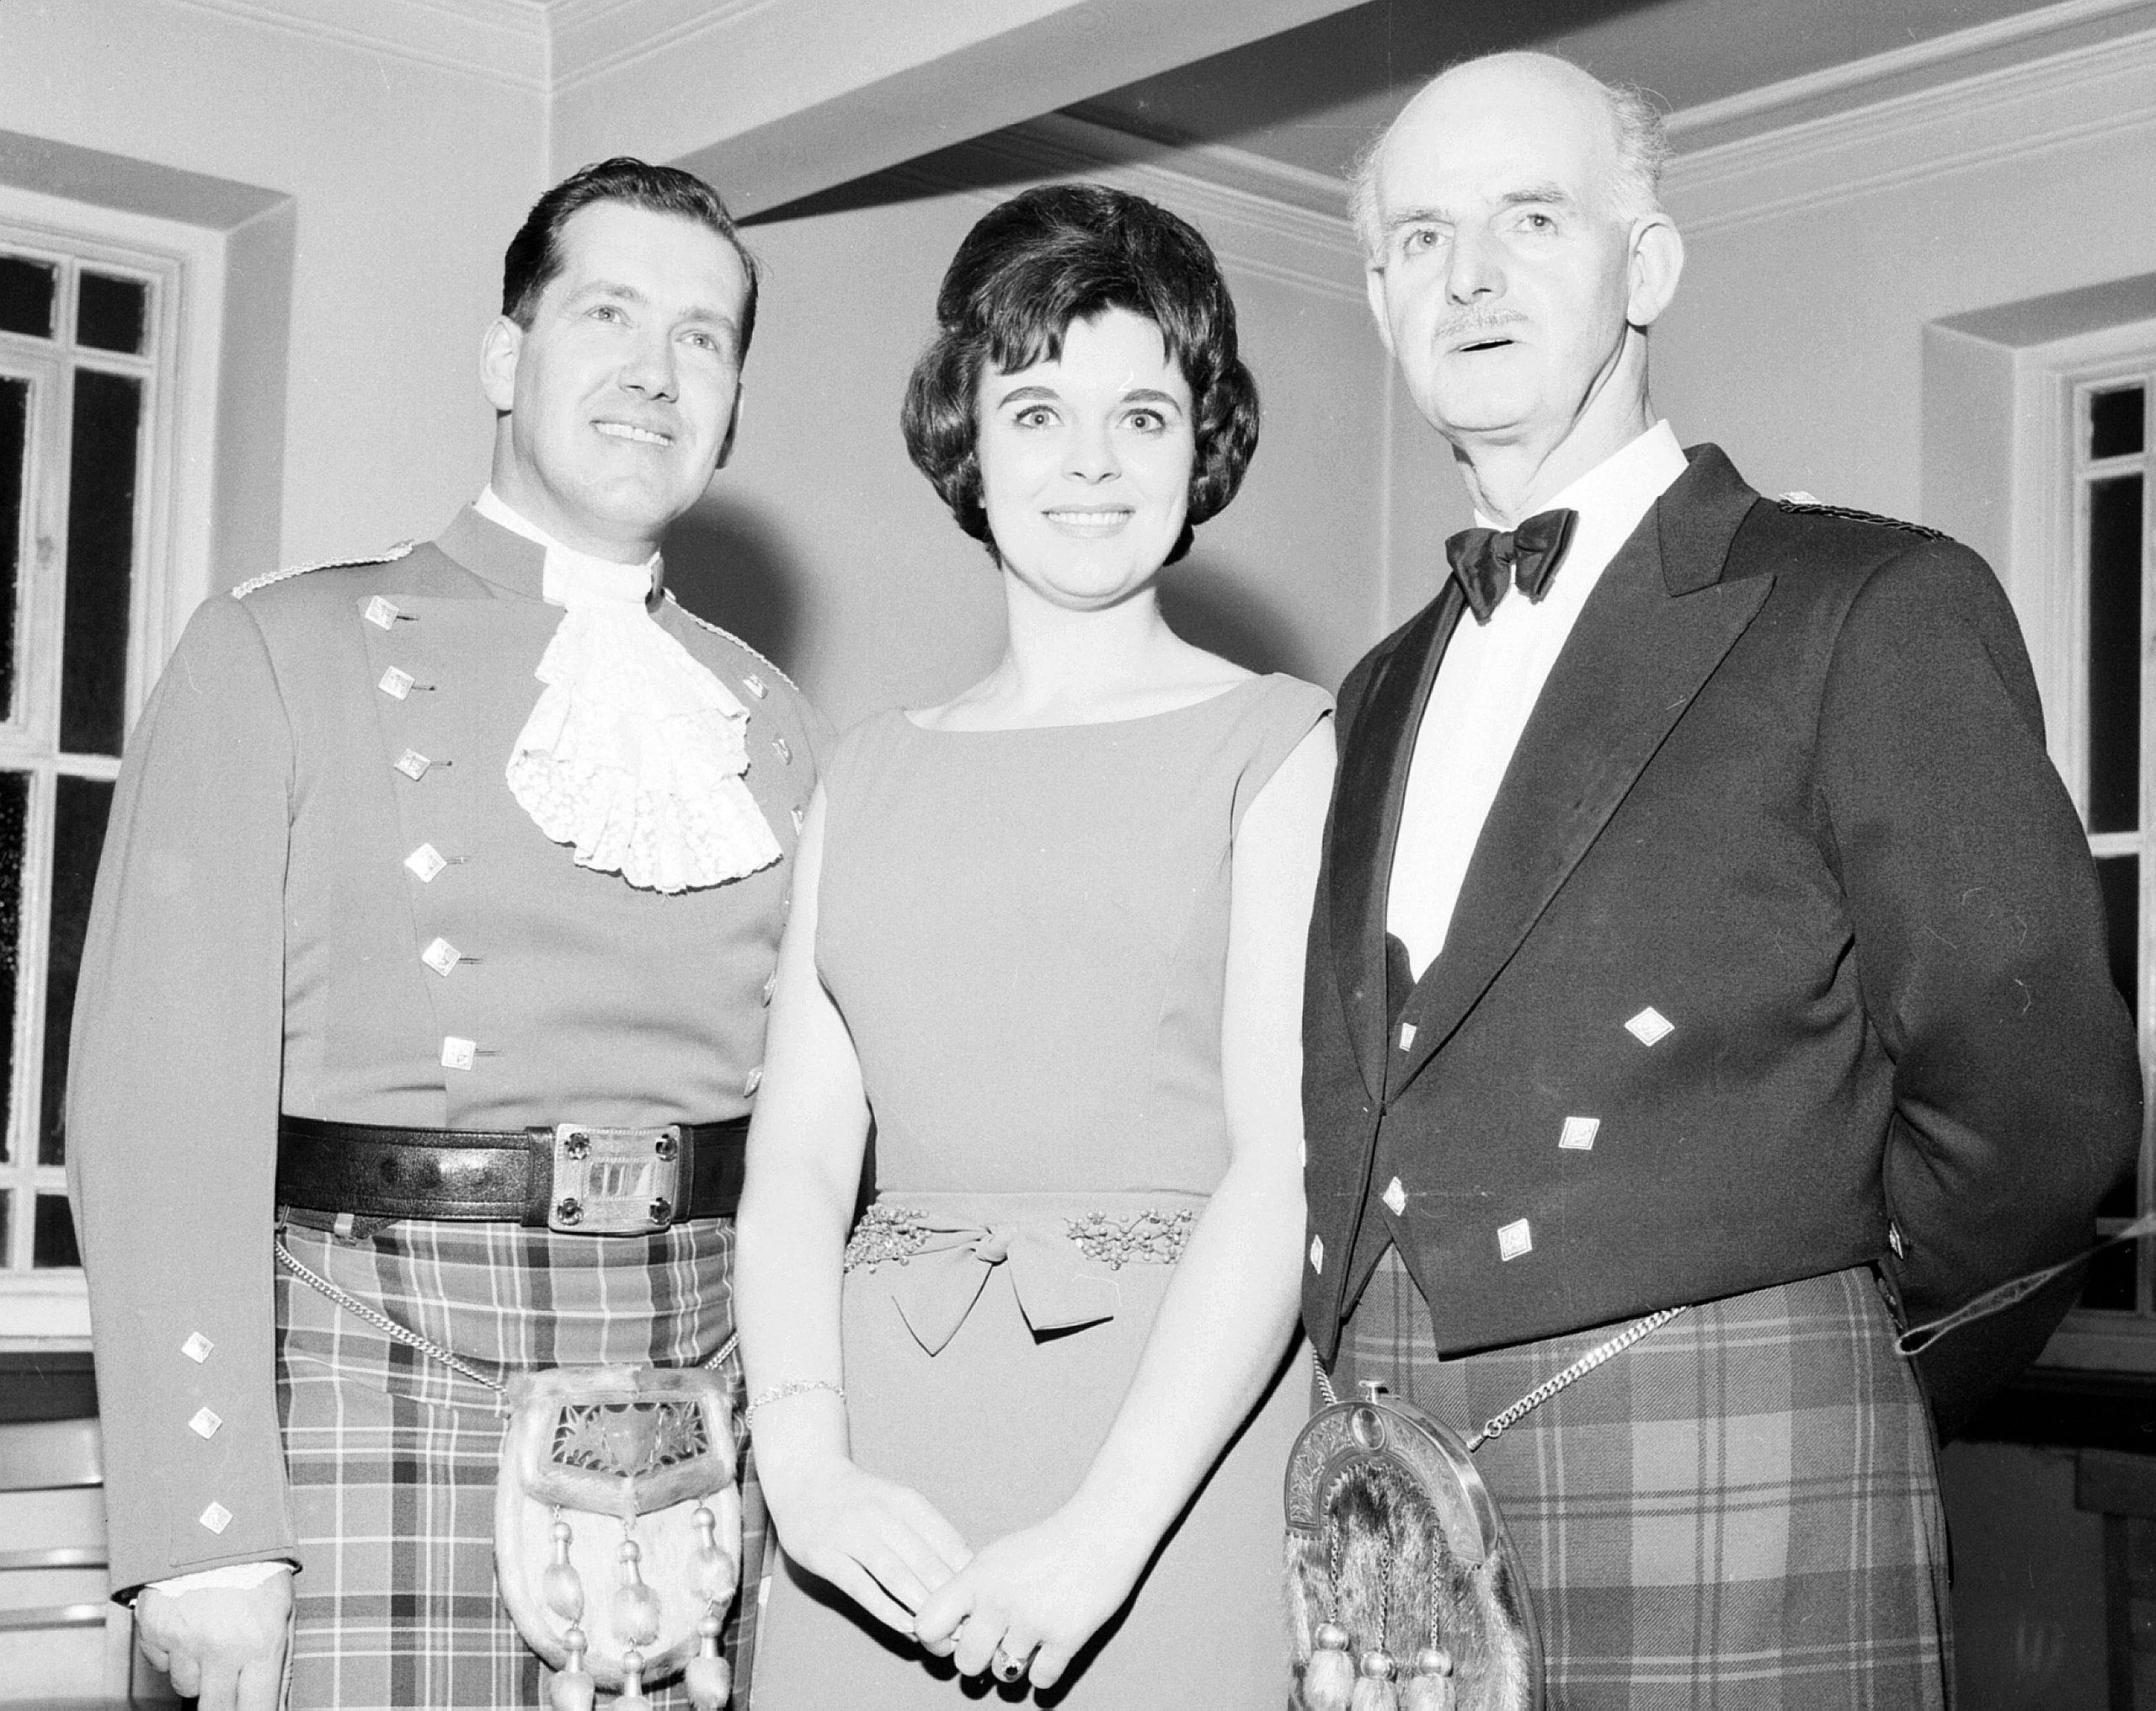 three people posing in formal wear